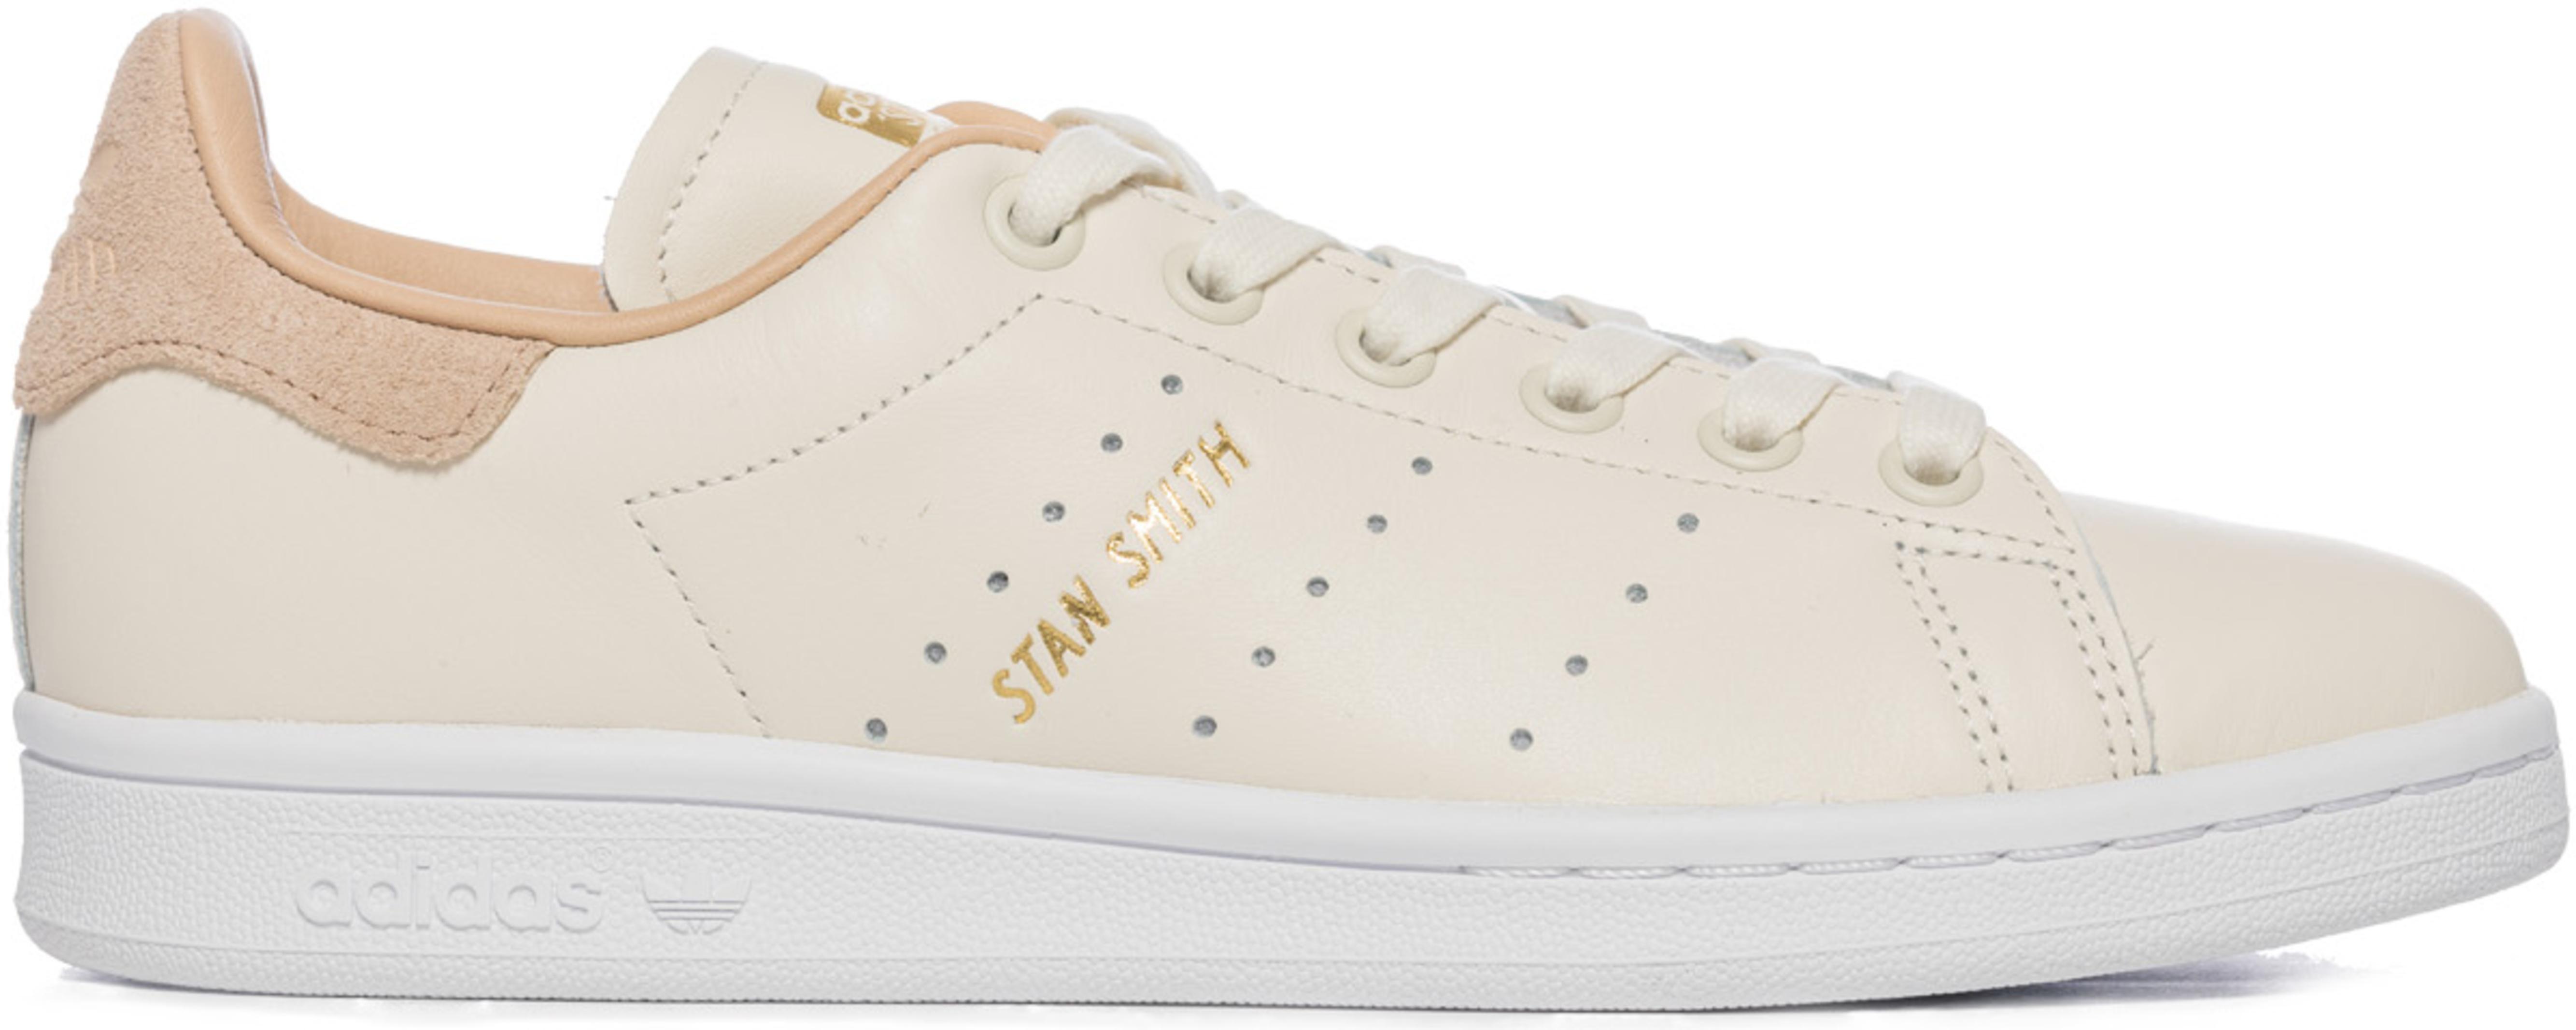 44772160c53c adidas Originals  Stan Smith - off White Off White